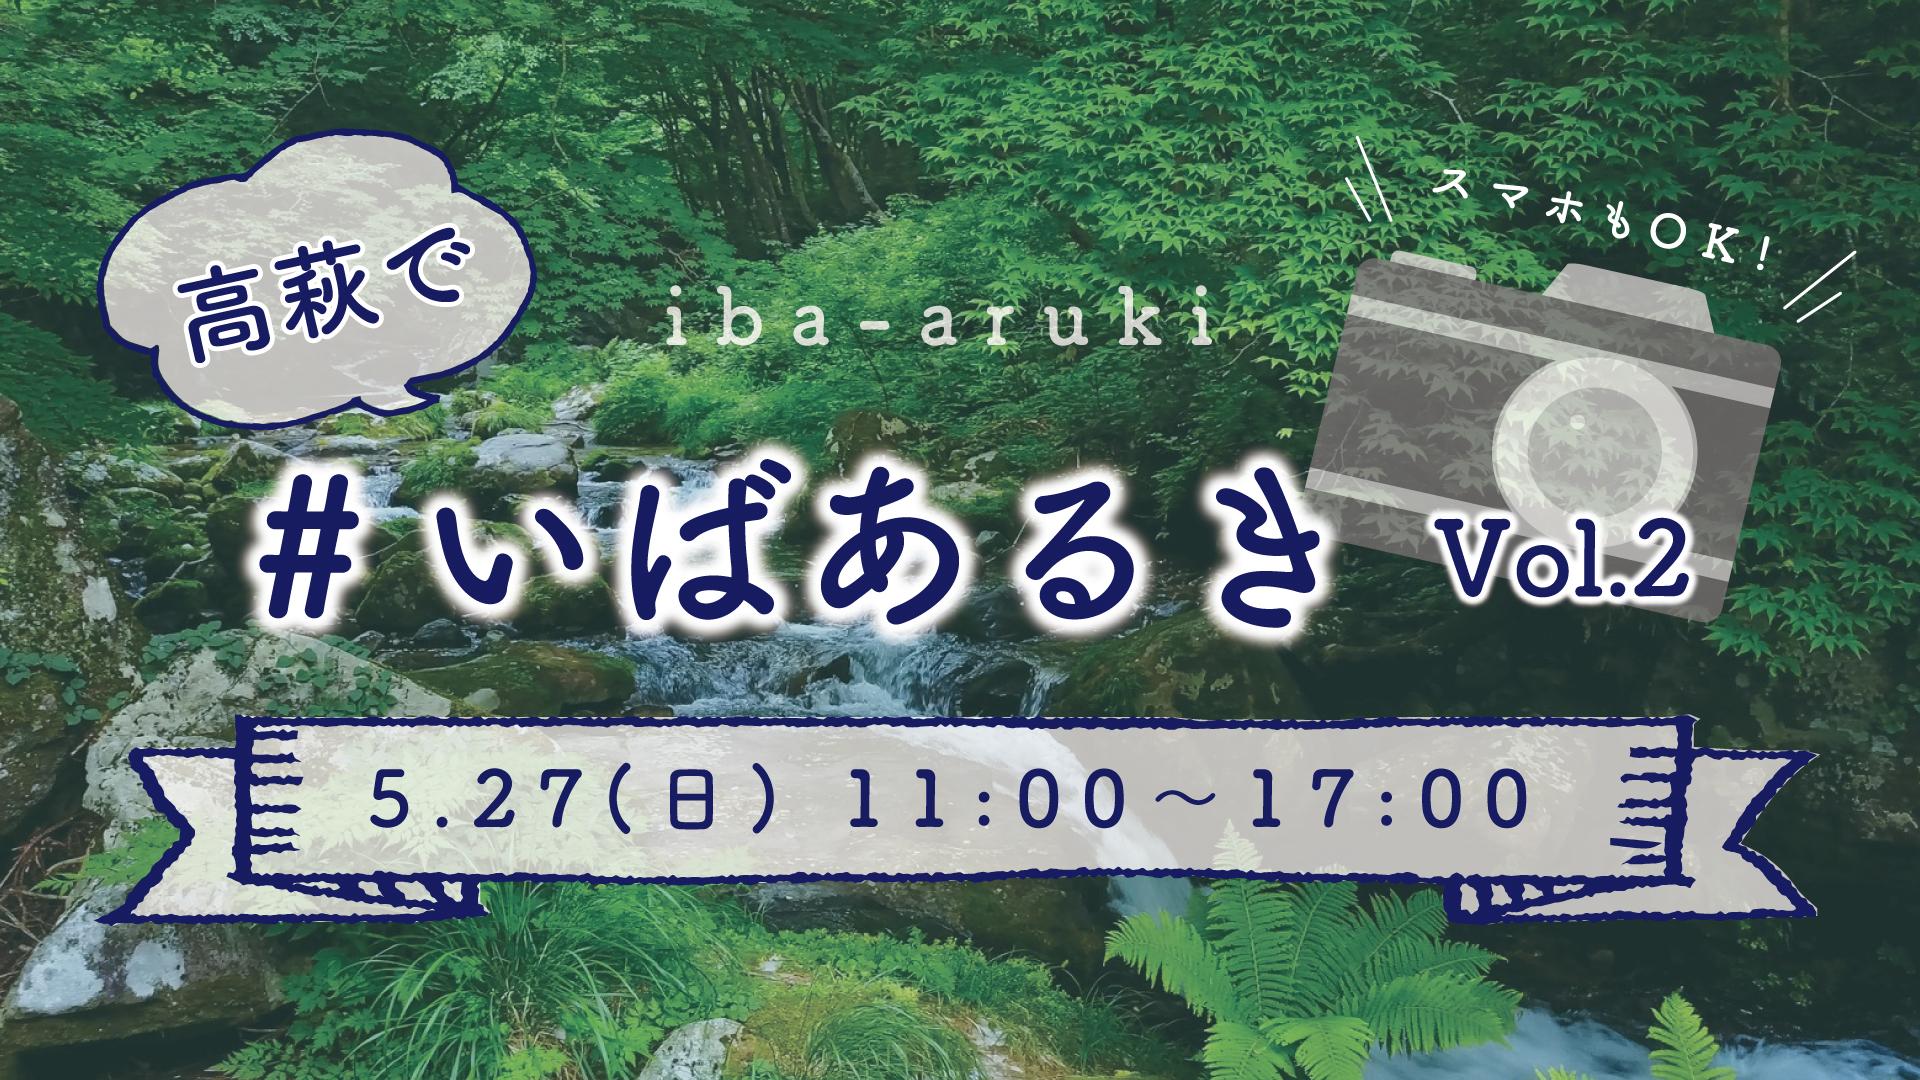 ibaaruki-vol2